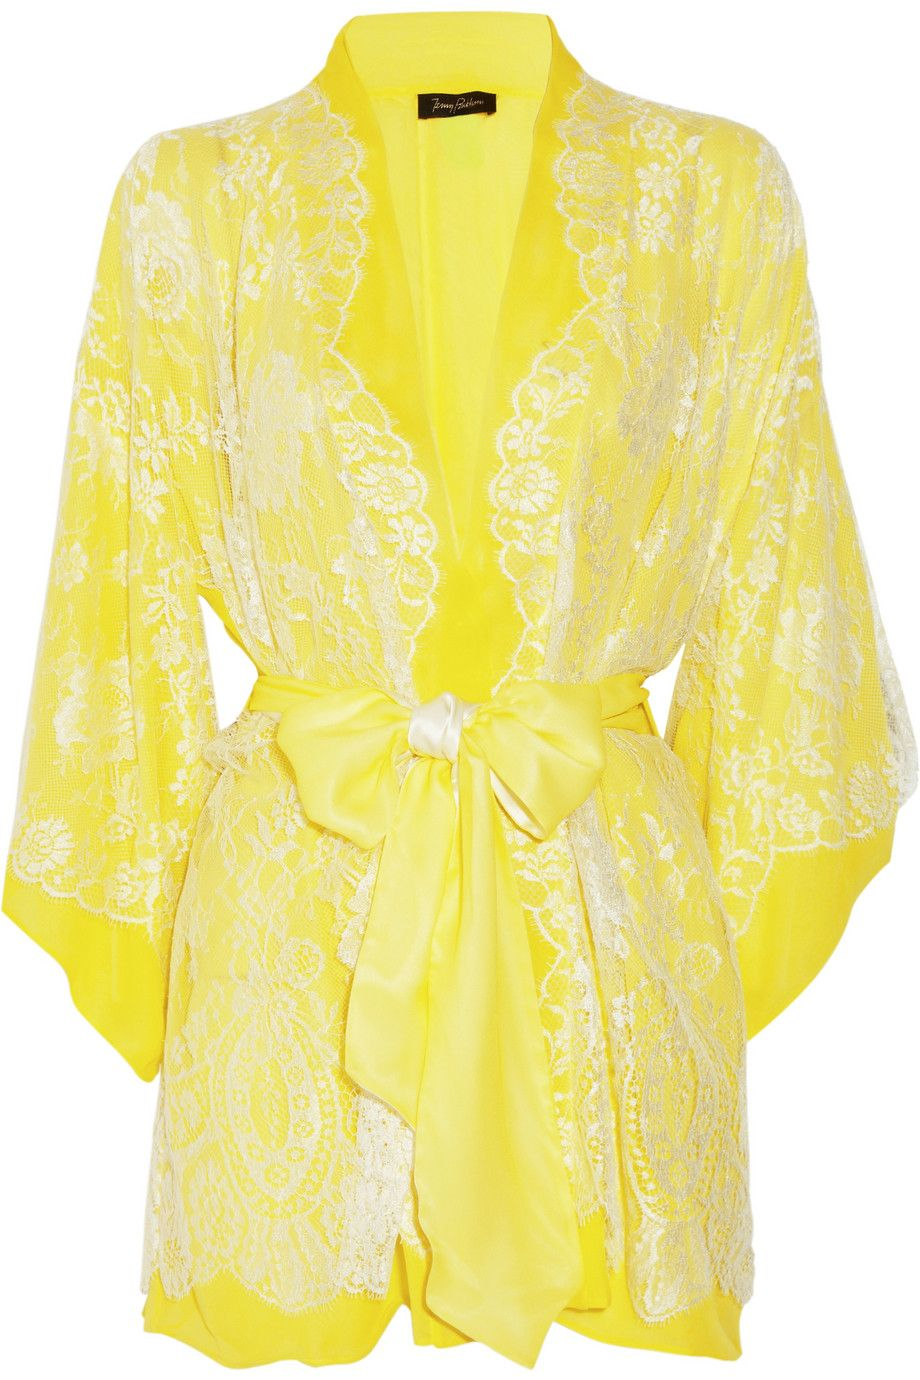 Lingerie robe yellow